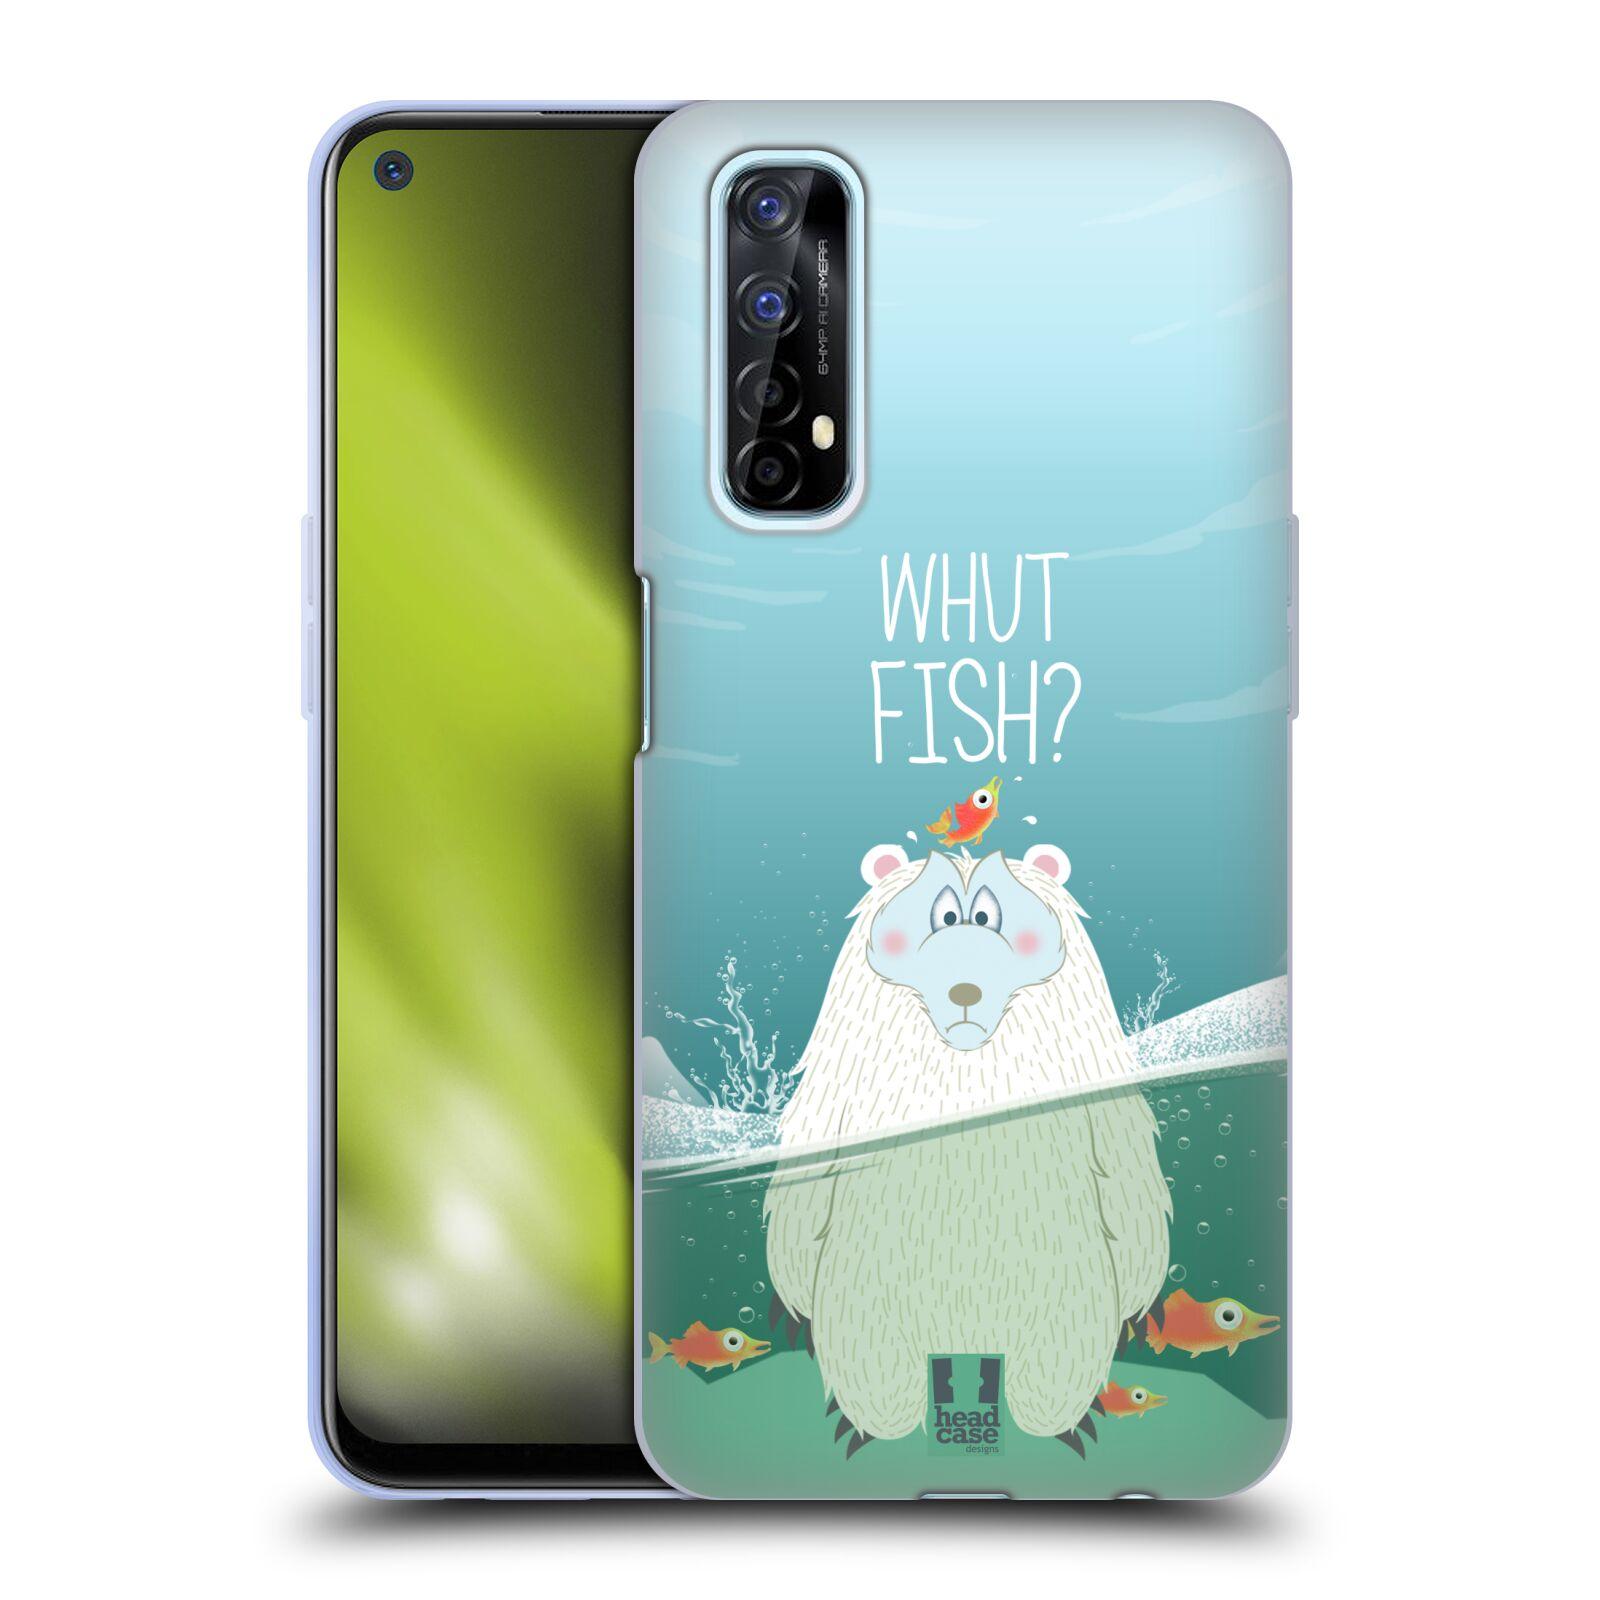 Silikonové pouzdro na mobil Realme 7 - Head Case - Medvěd Whut Fish?